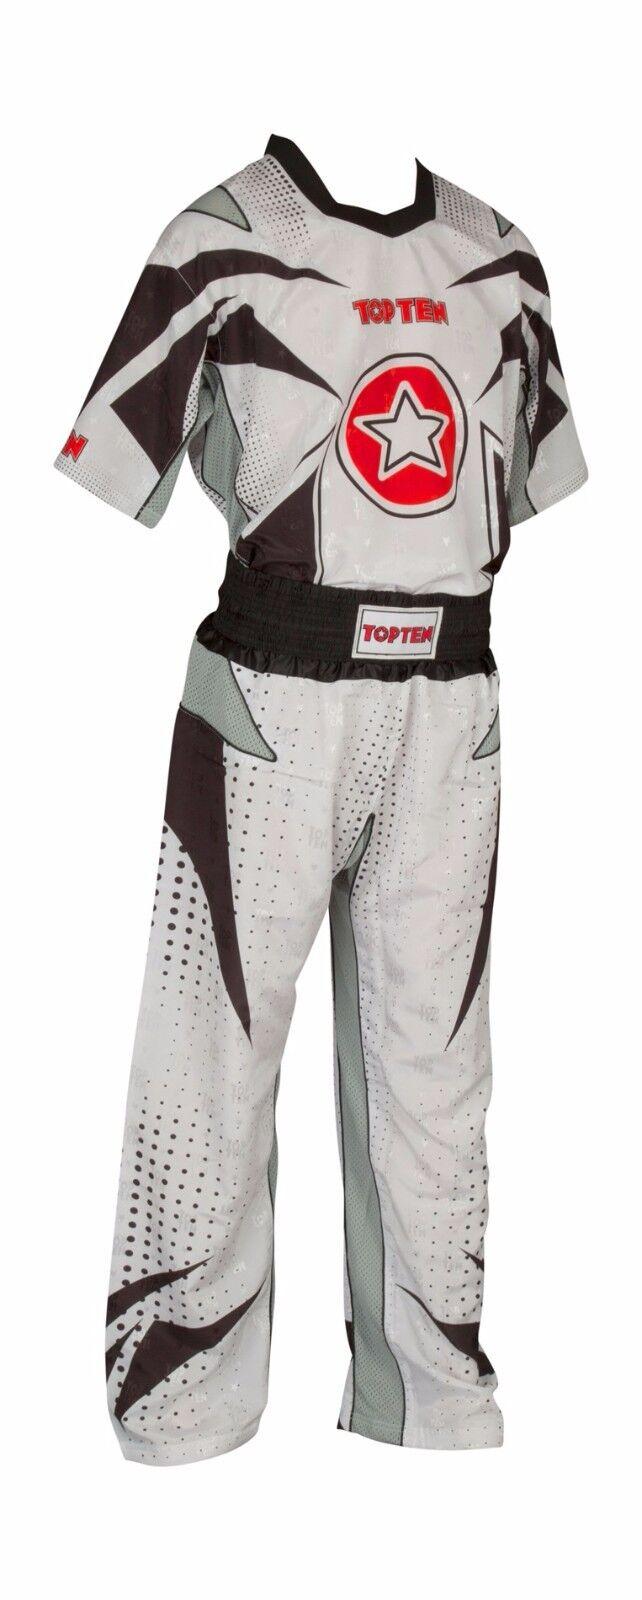 Kickbox - Uniform TOP TEN  FUTURE , 6 untersch. Farbkombinationen